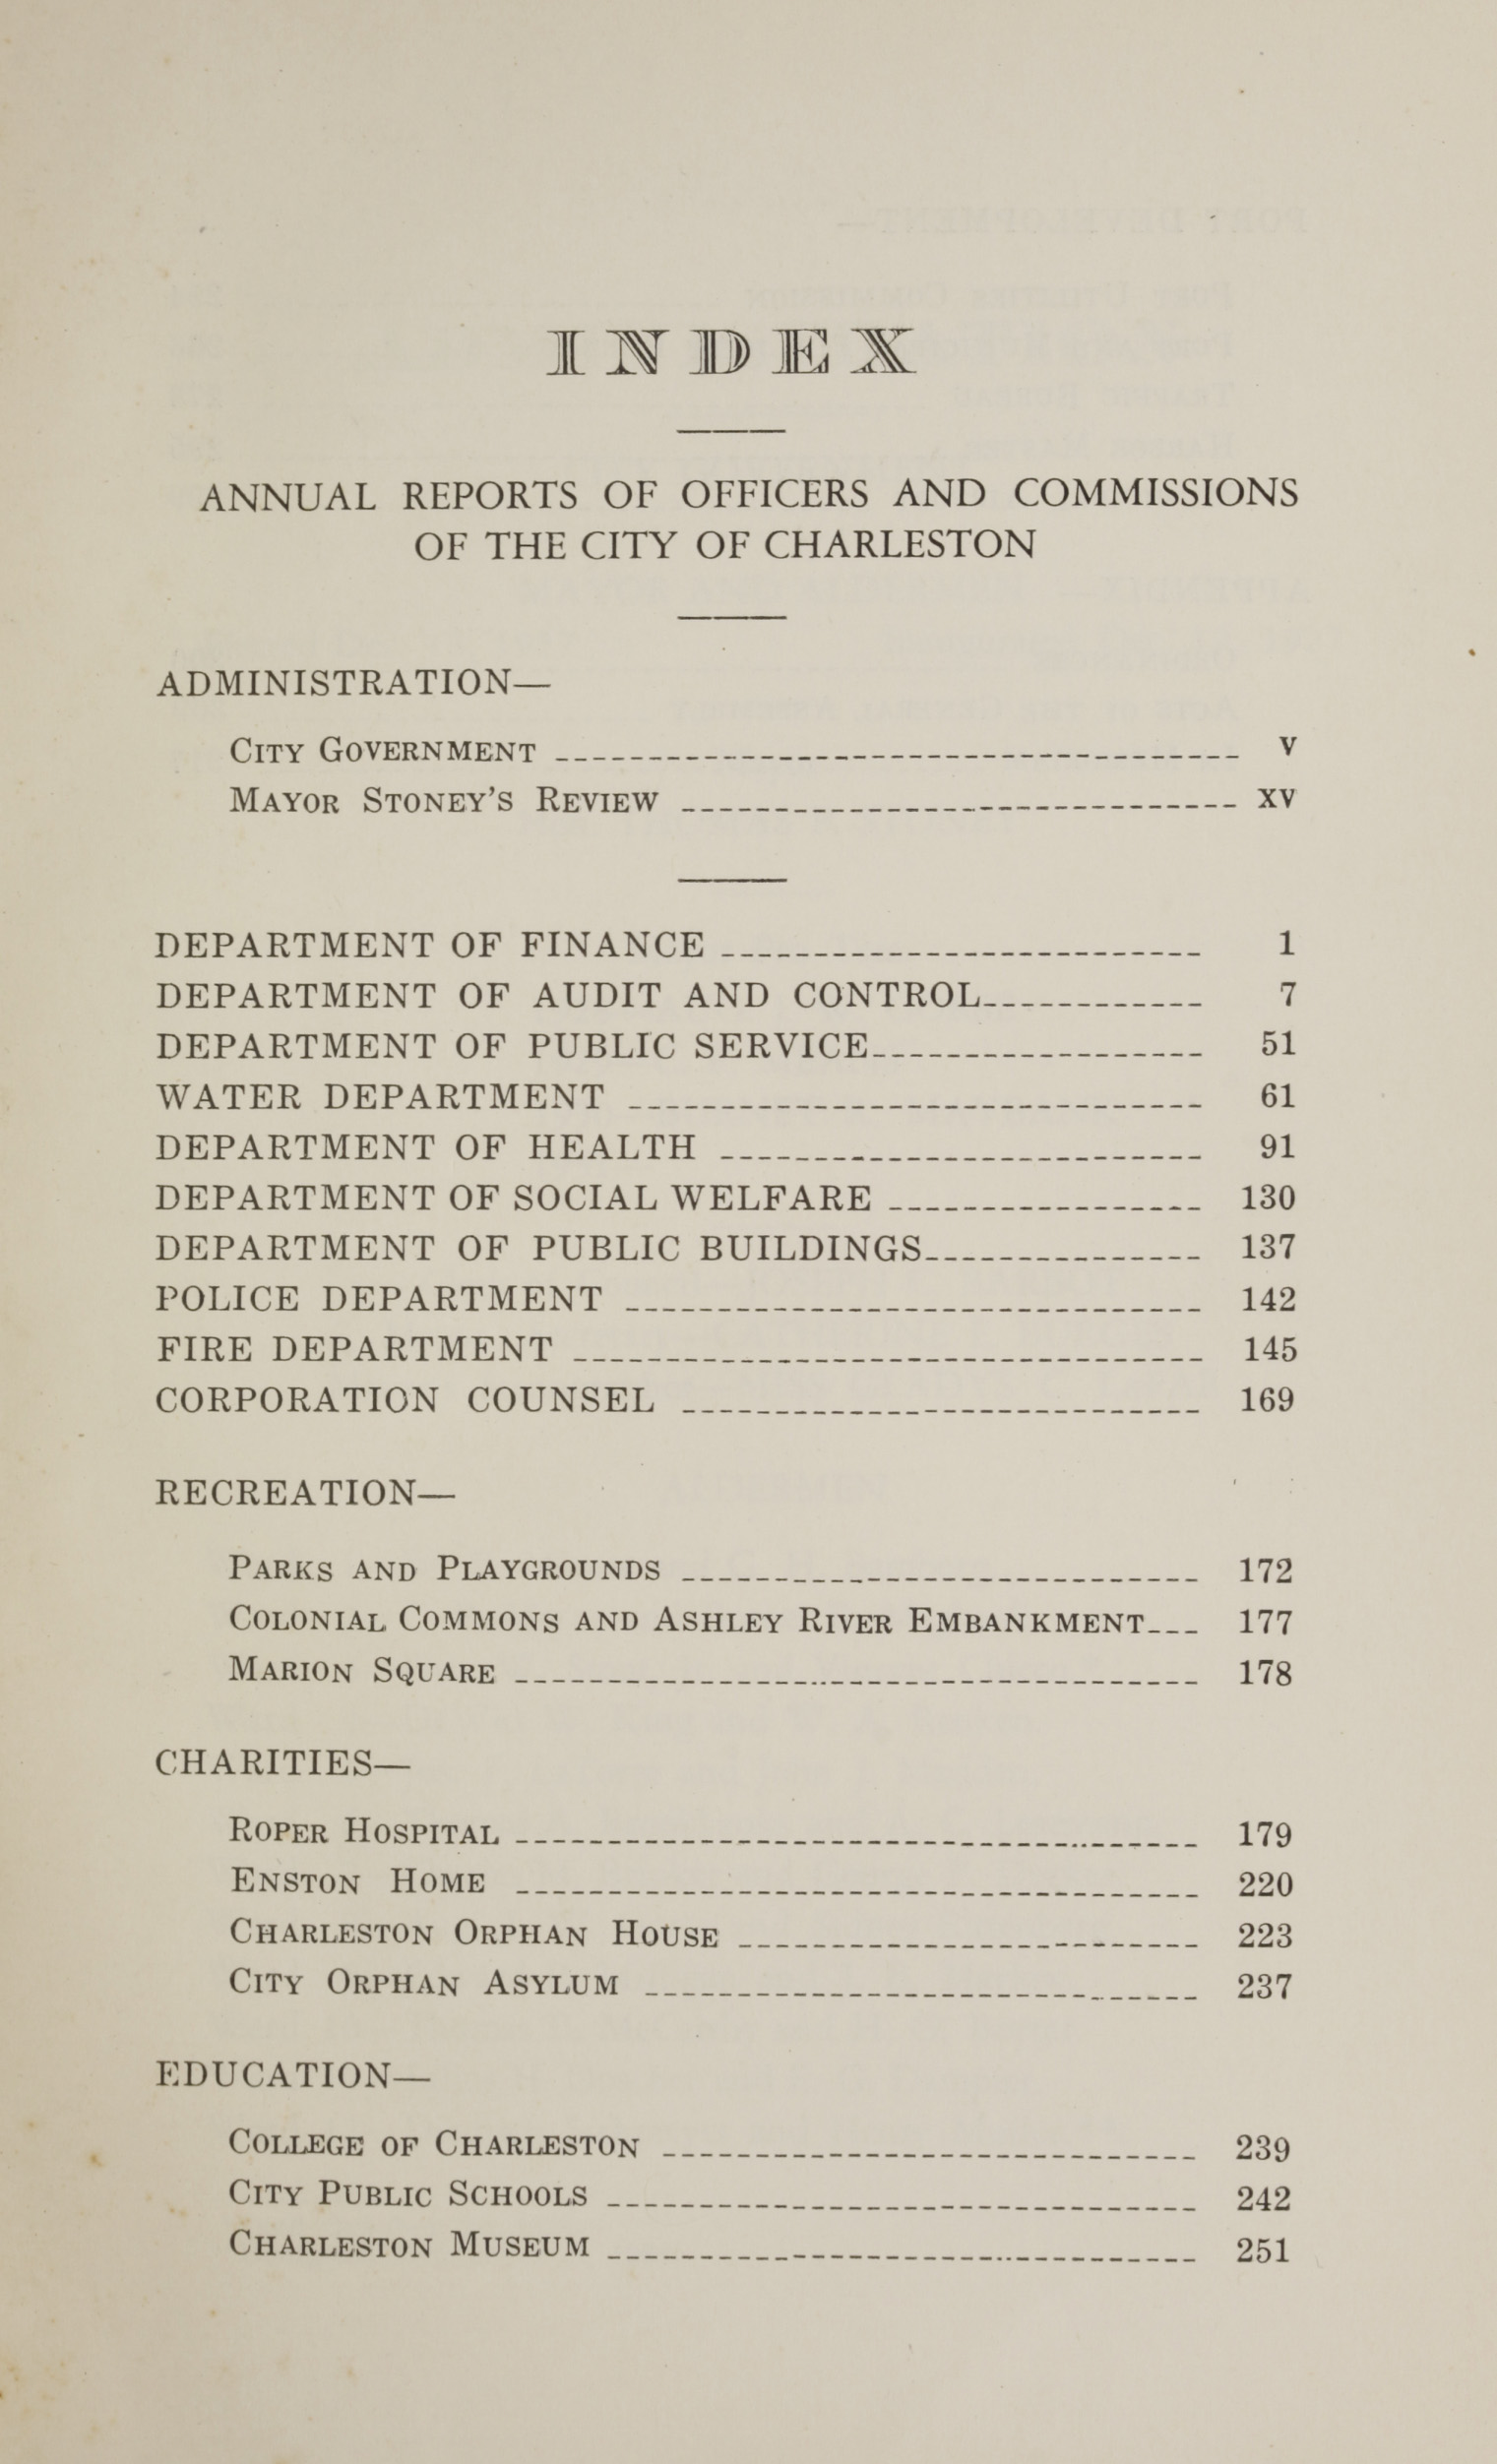 Charleston Yearbook, 1930, page iii